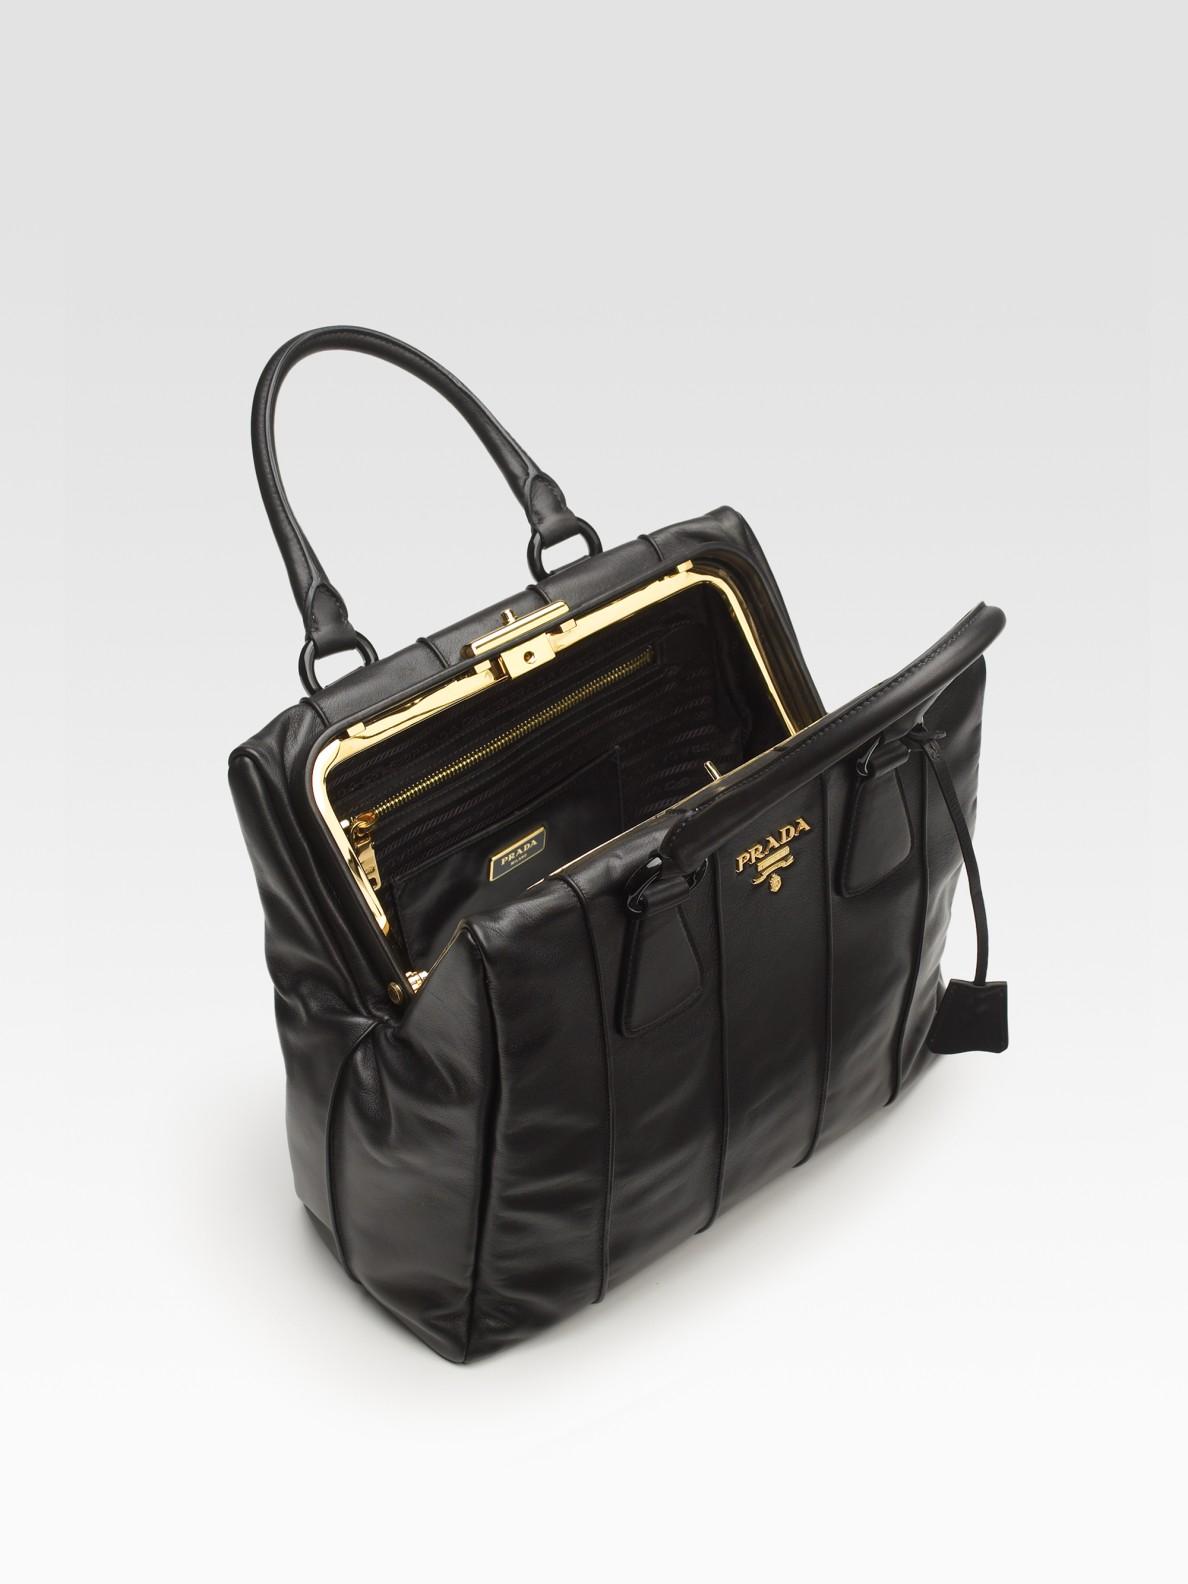 prada fringe purse - prada soft calf frame bag, prada promenade mini